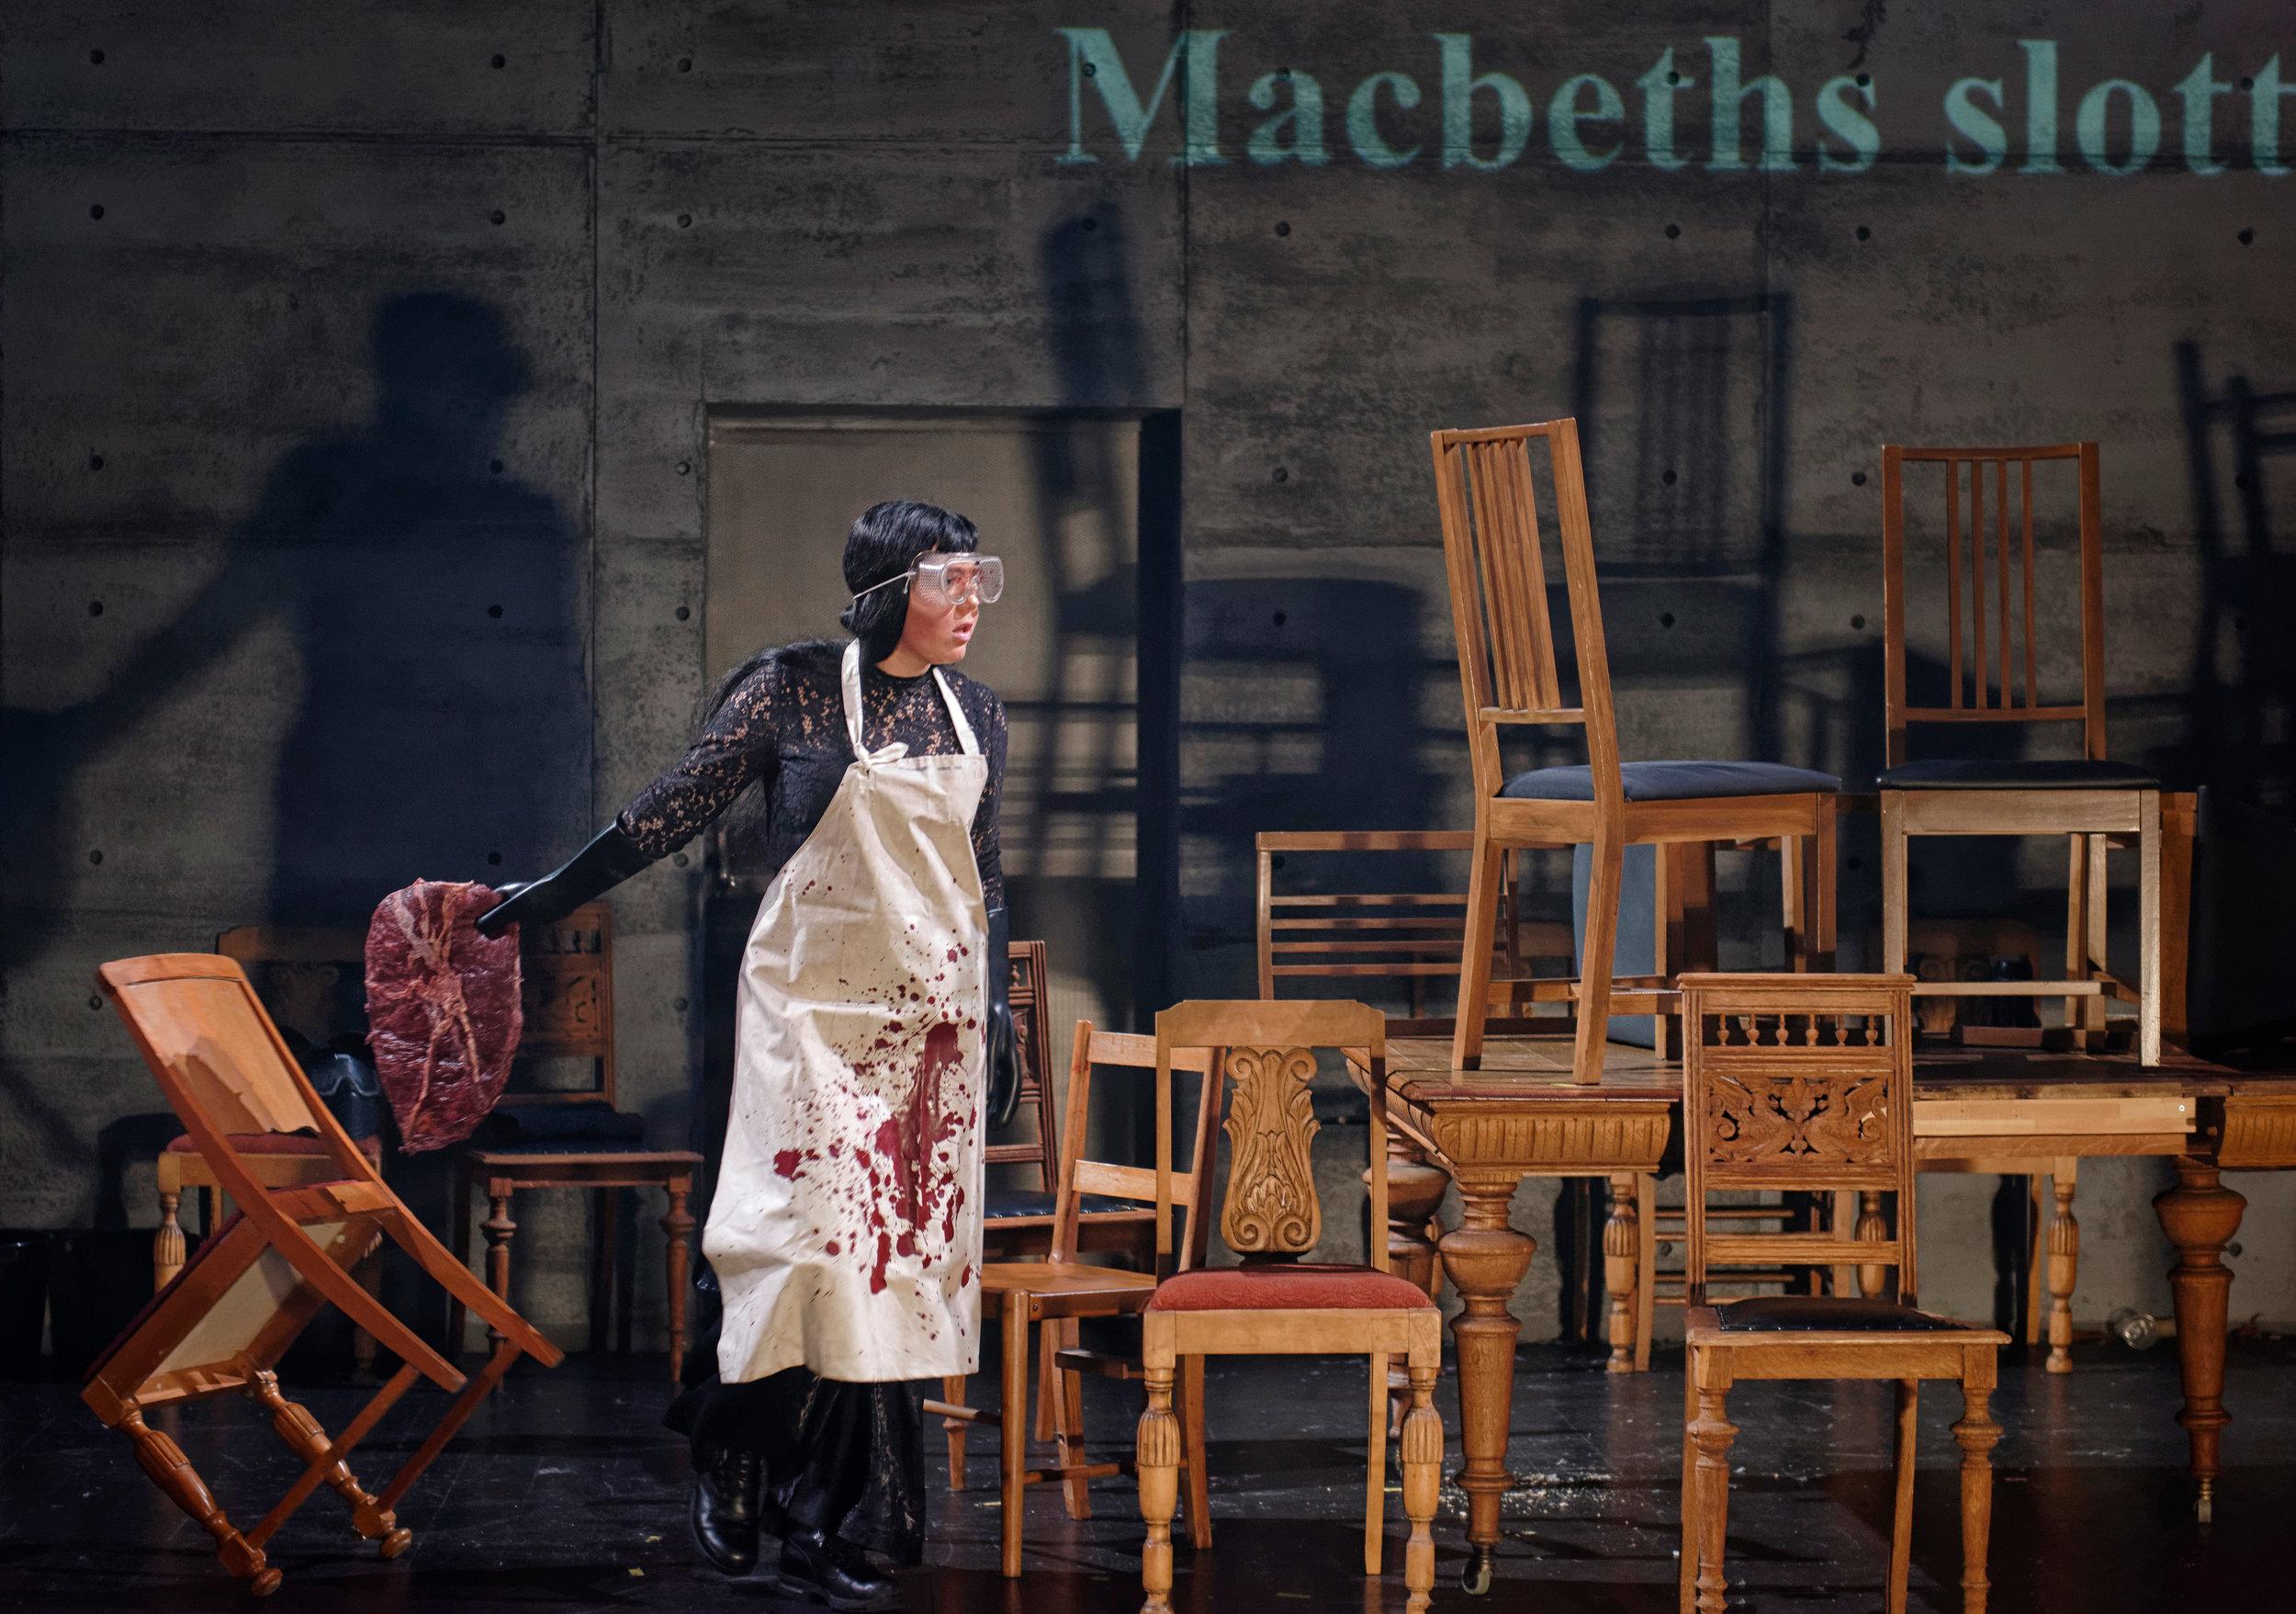 Macbeth (2017): Lady Macbeth er pådriveren i voldsutøvelsen.